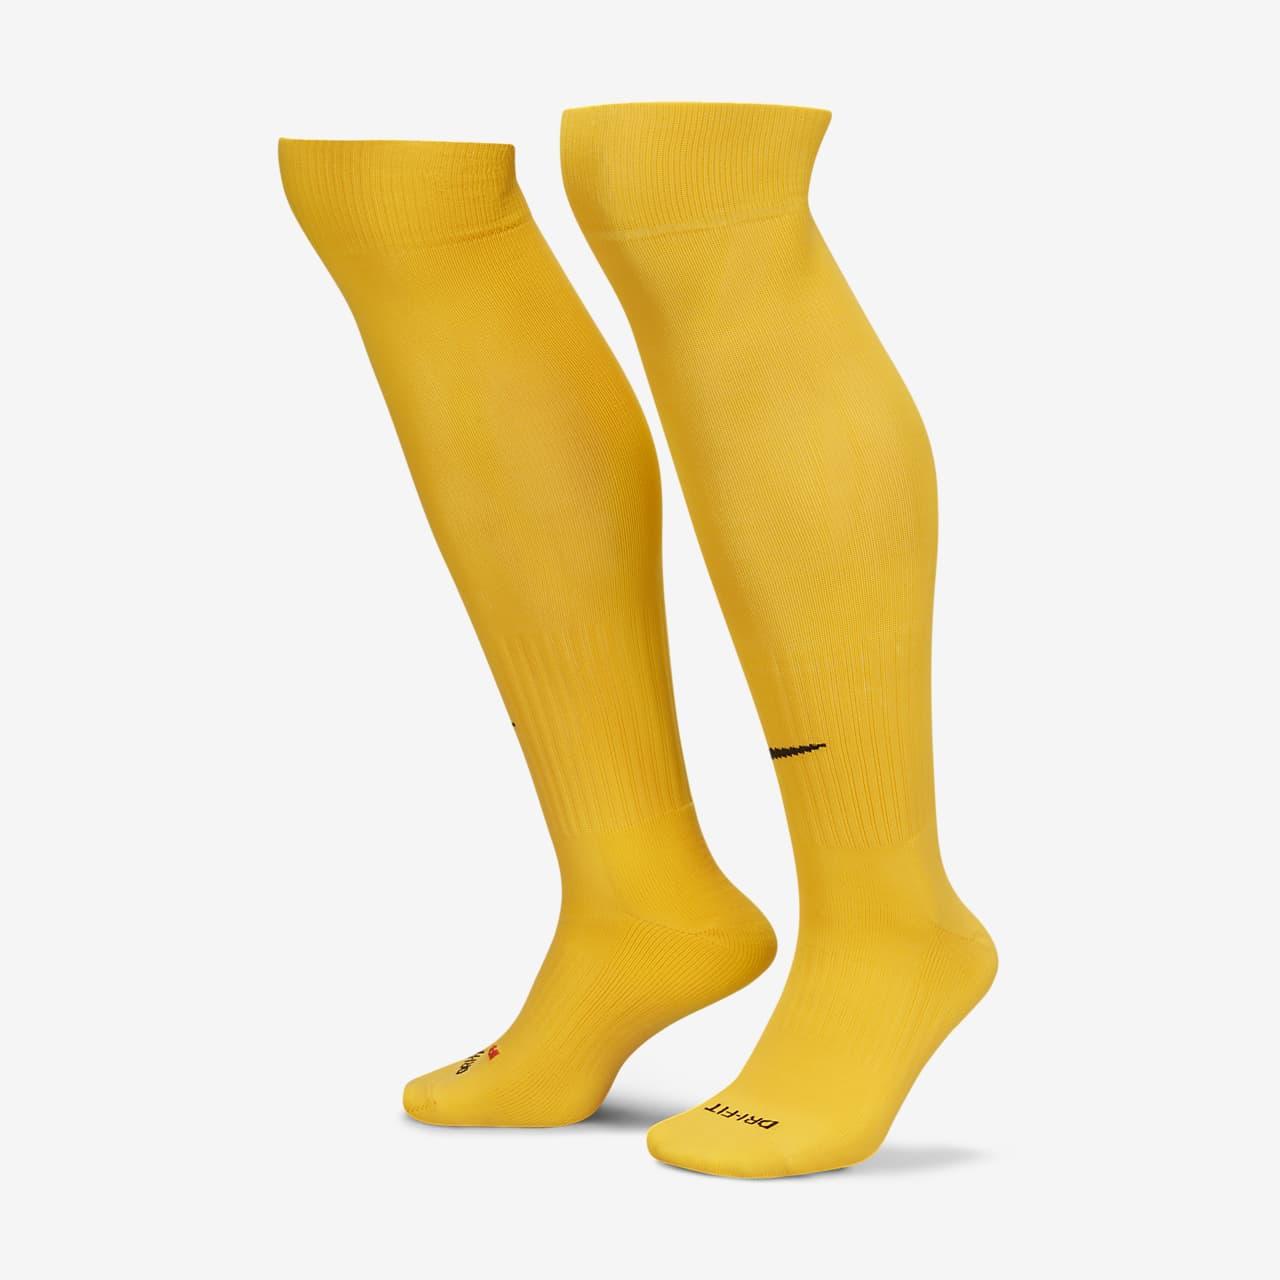 Nike Classic 2 Cushioned Over-the-Calf Football Sock